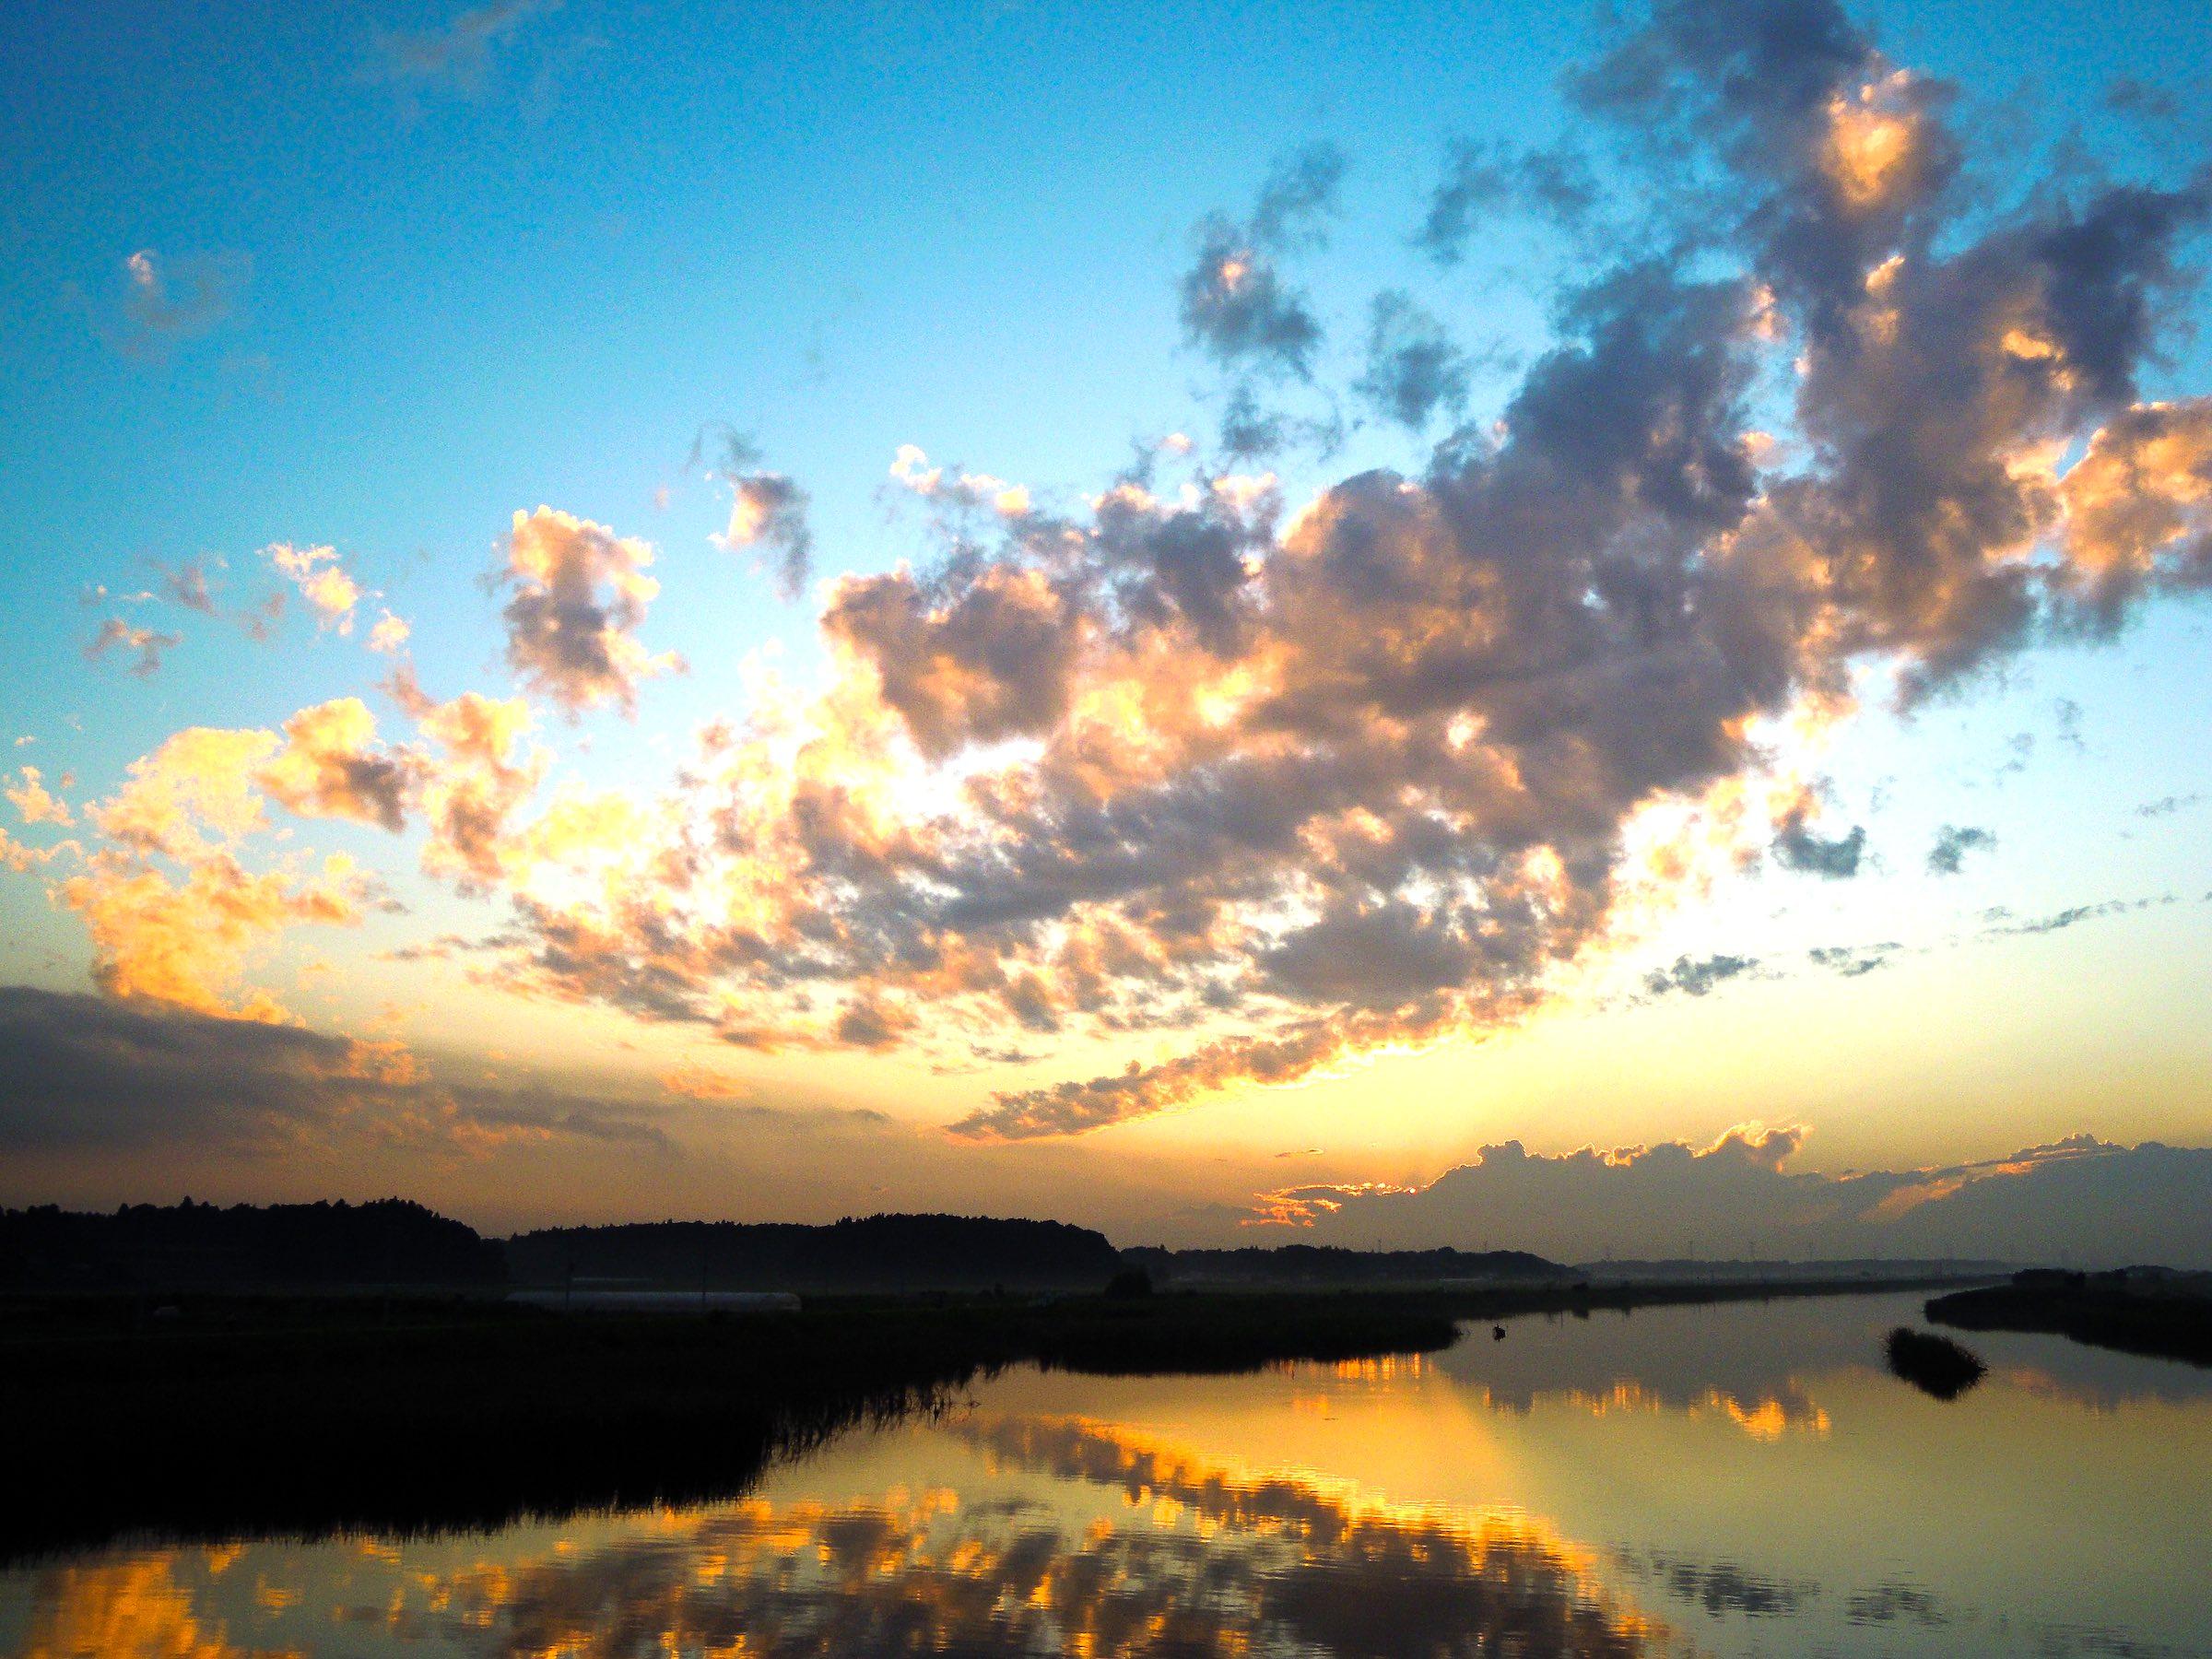 Evening View of Teganuma Lake, Chiba, Japan